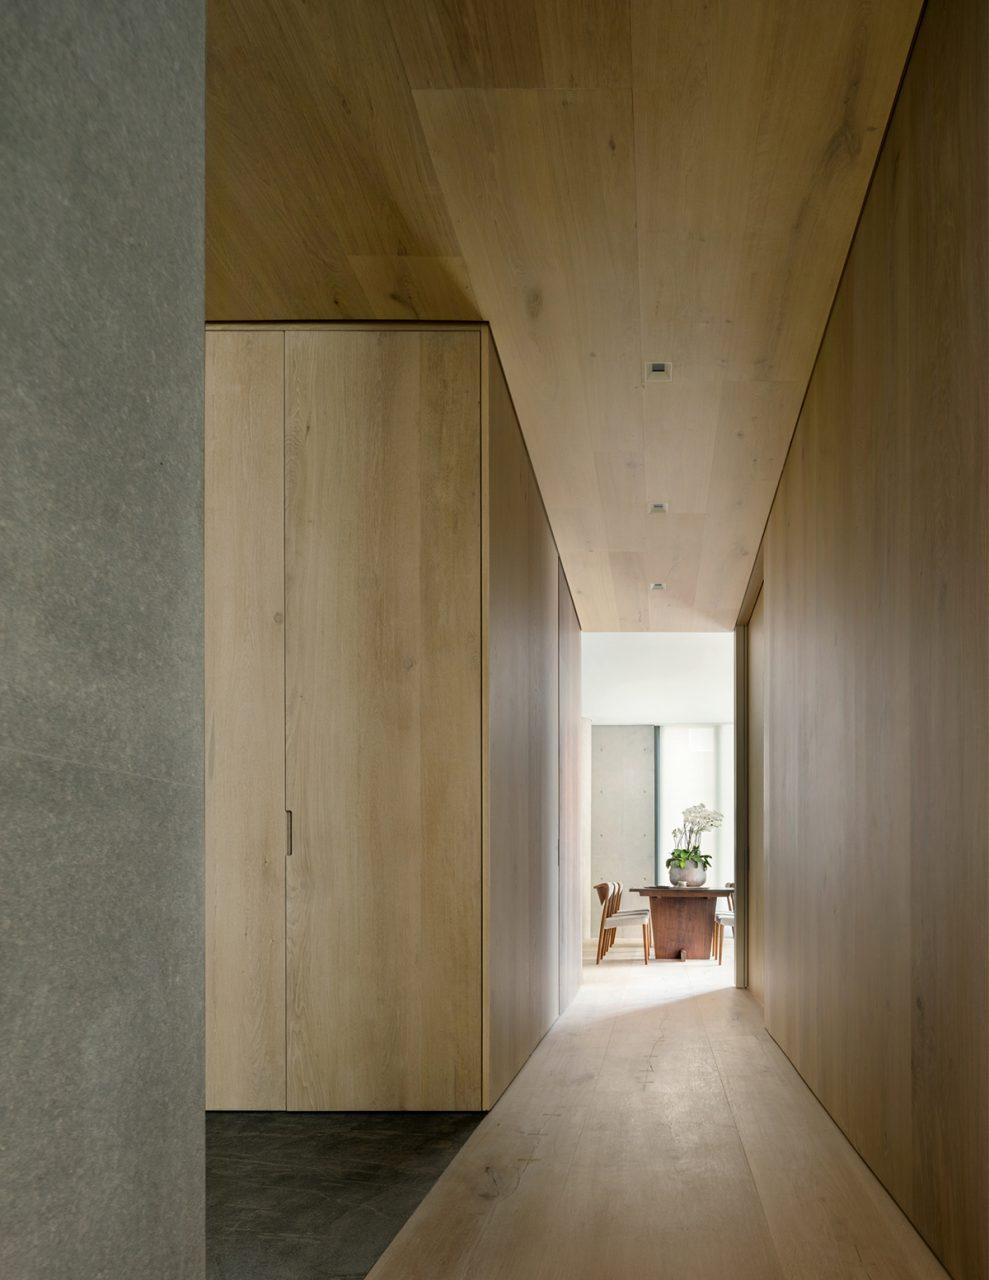 Photo of wood-clad interior hallway in apartment